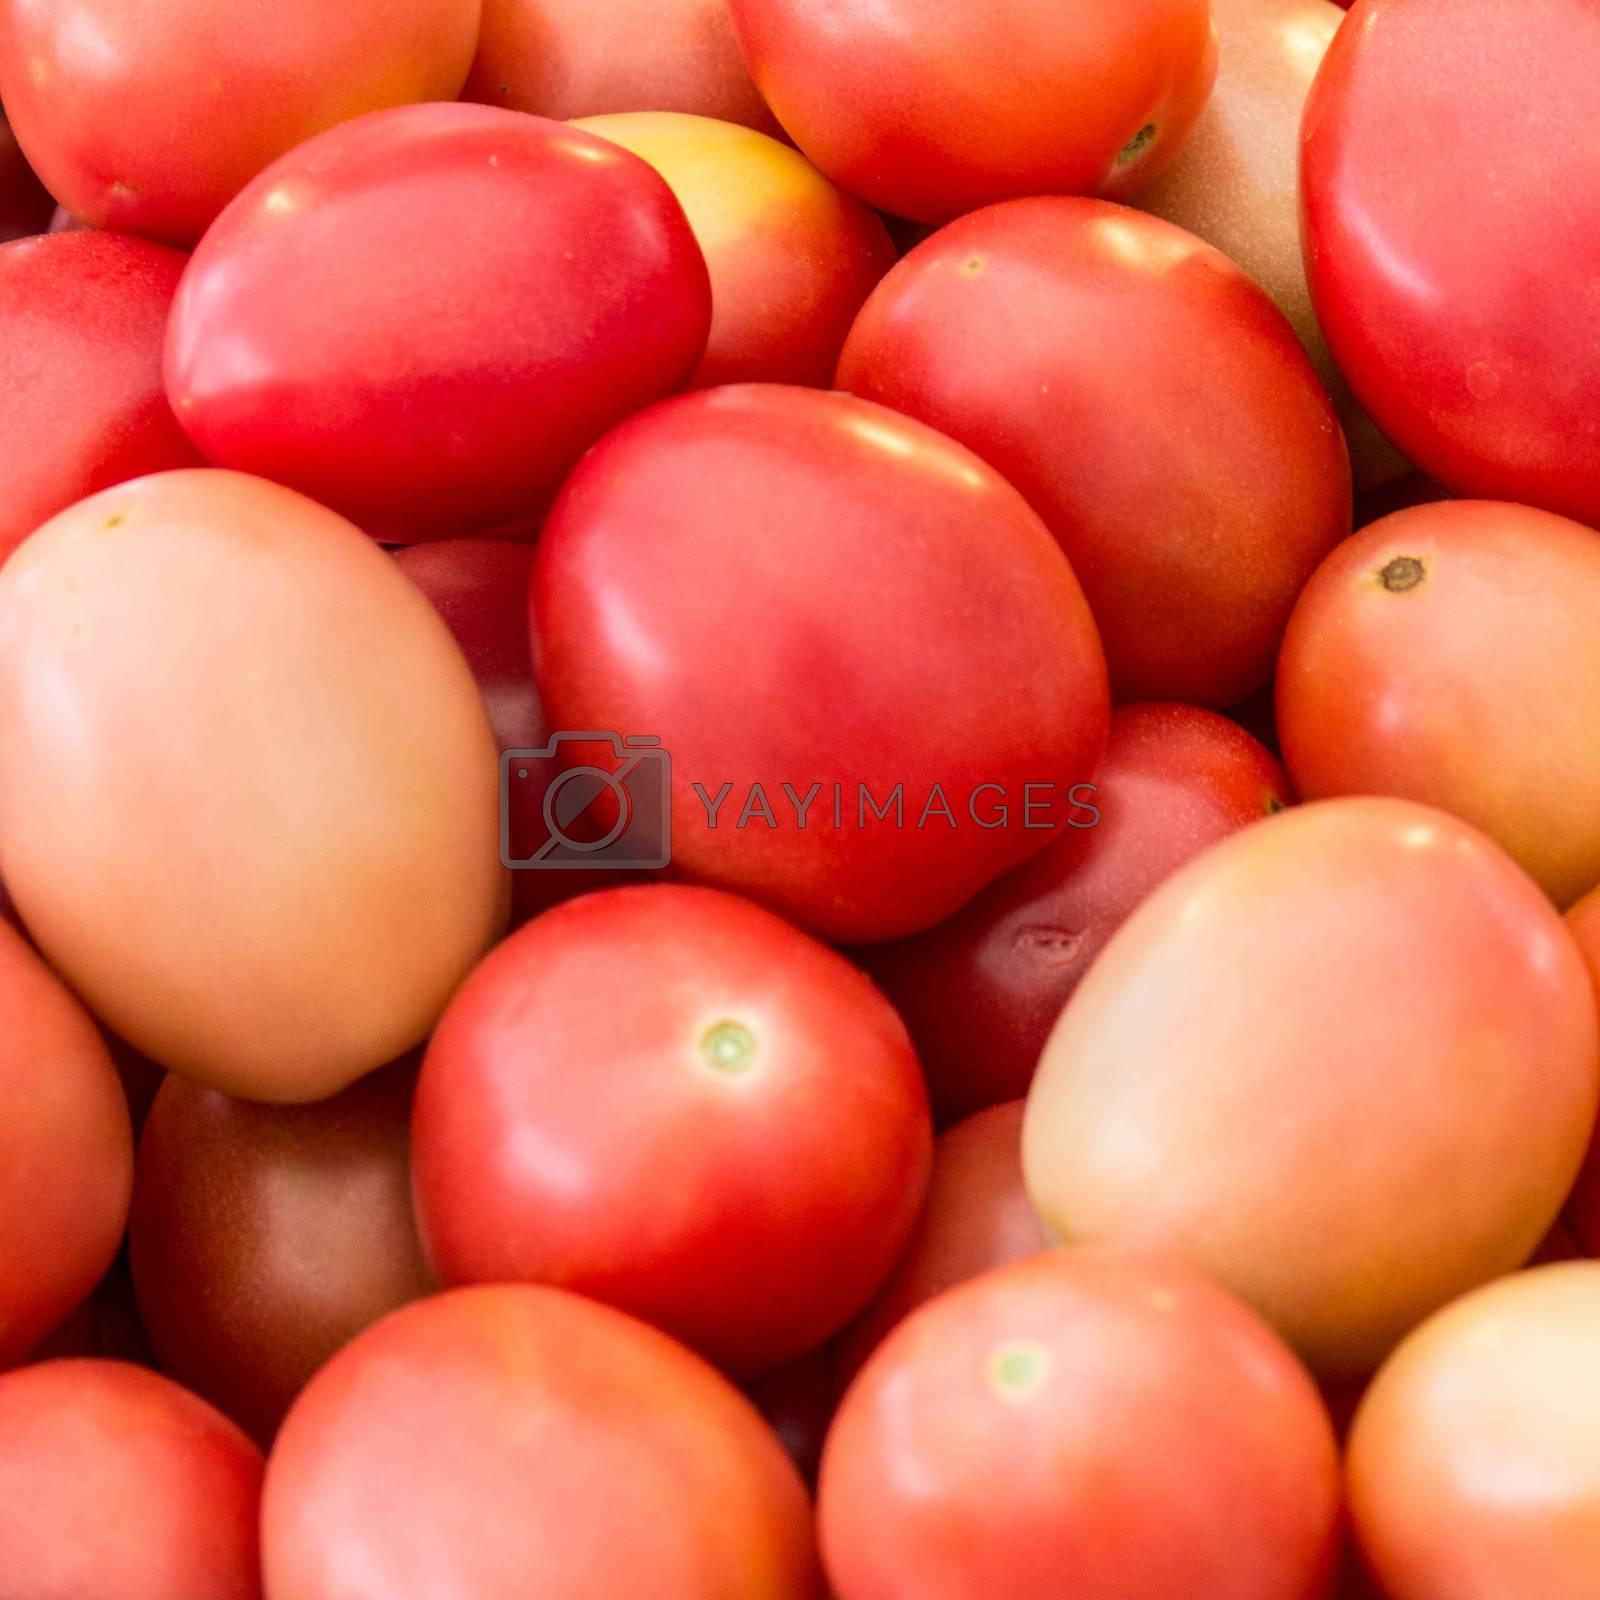 small tomato background for papaya salad (somtam)